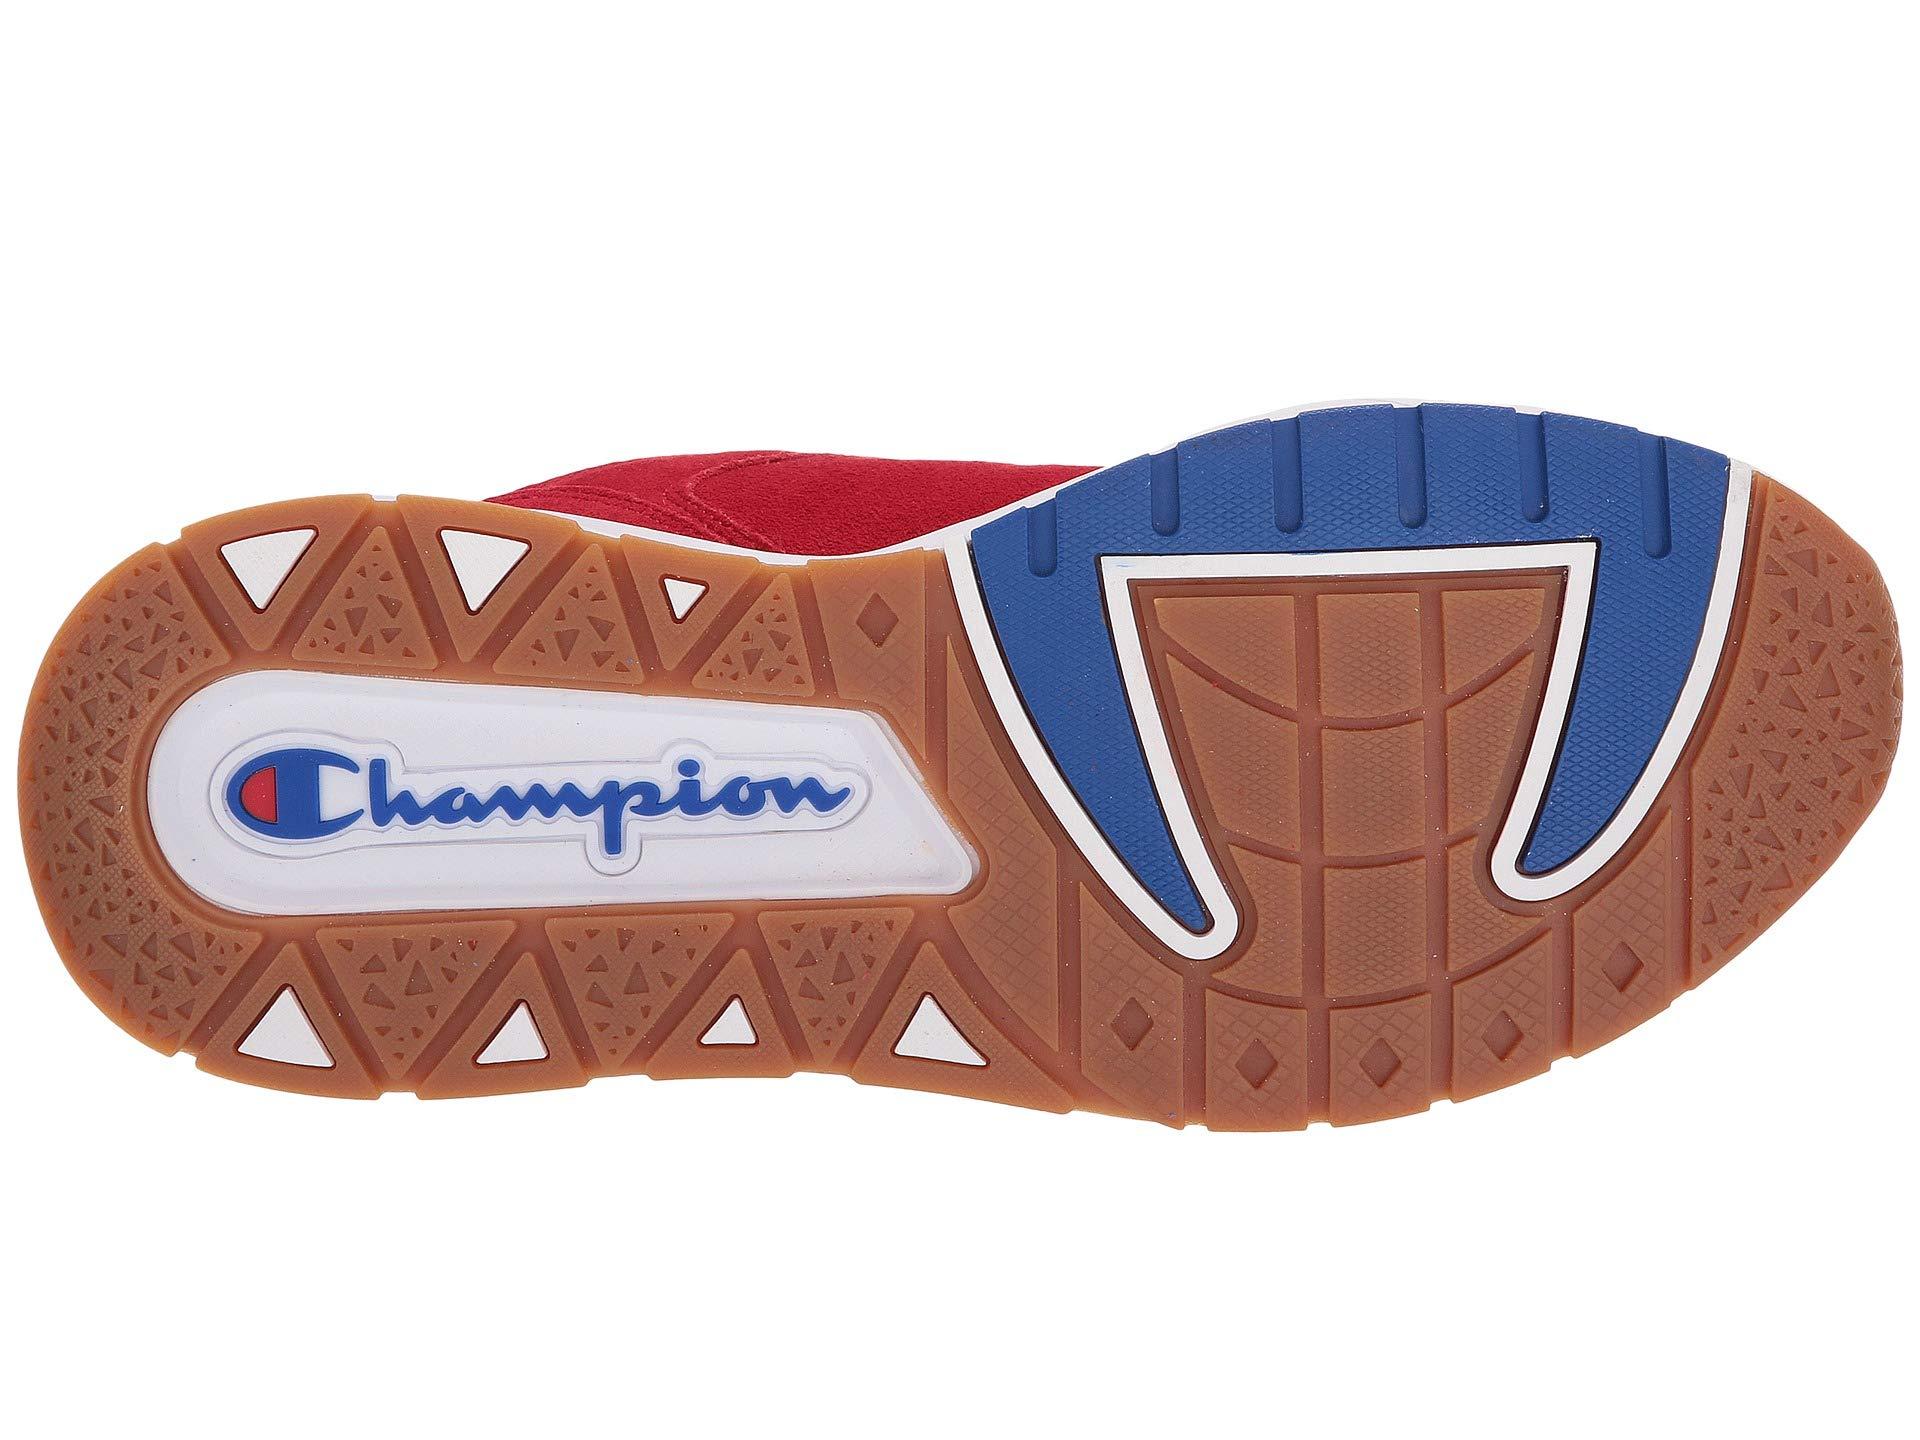 Champion Scarlet 93eighteen Scarlet Champion 93eighteen 93eighteen Scarlet Champion Champion 93eighteen TXRzAqWAw